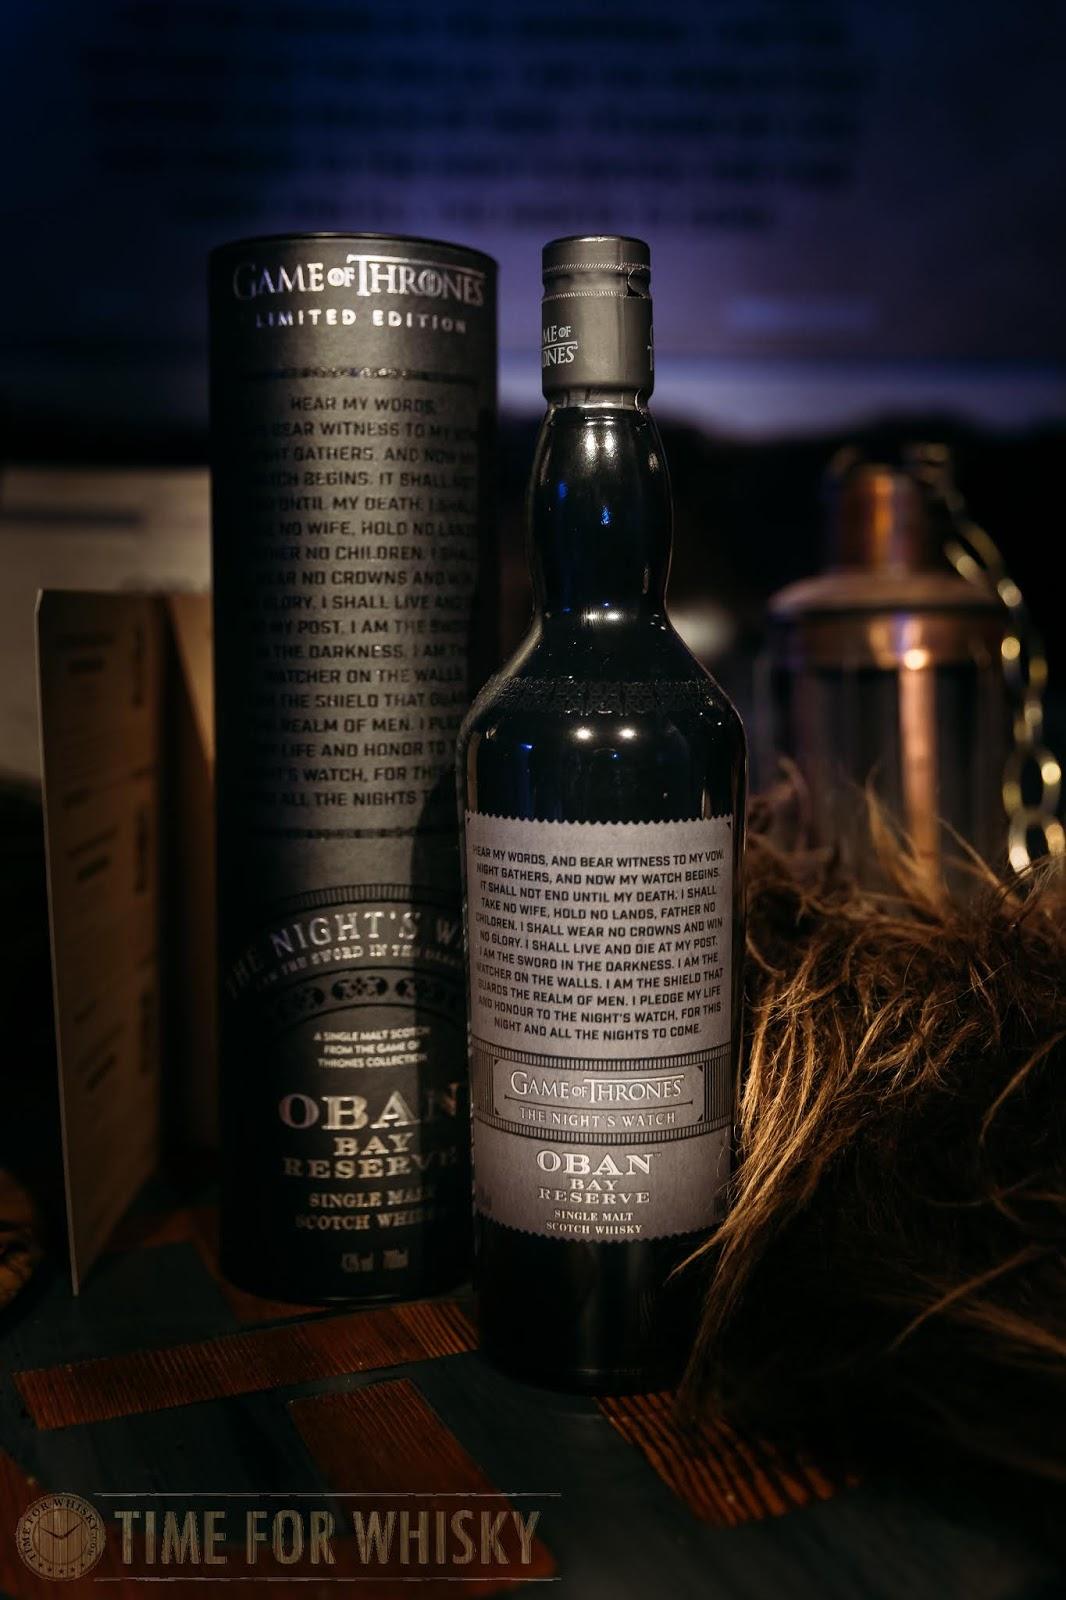 Time for Whisky com